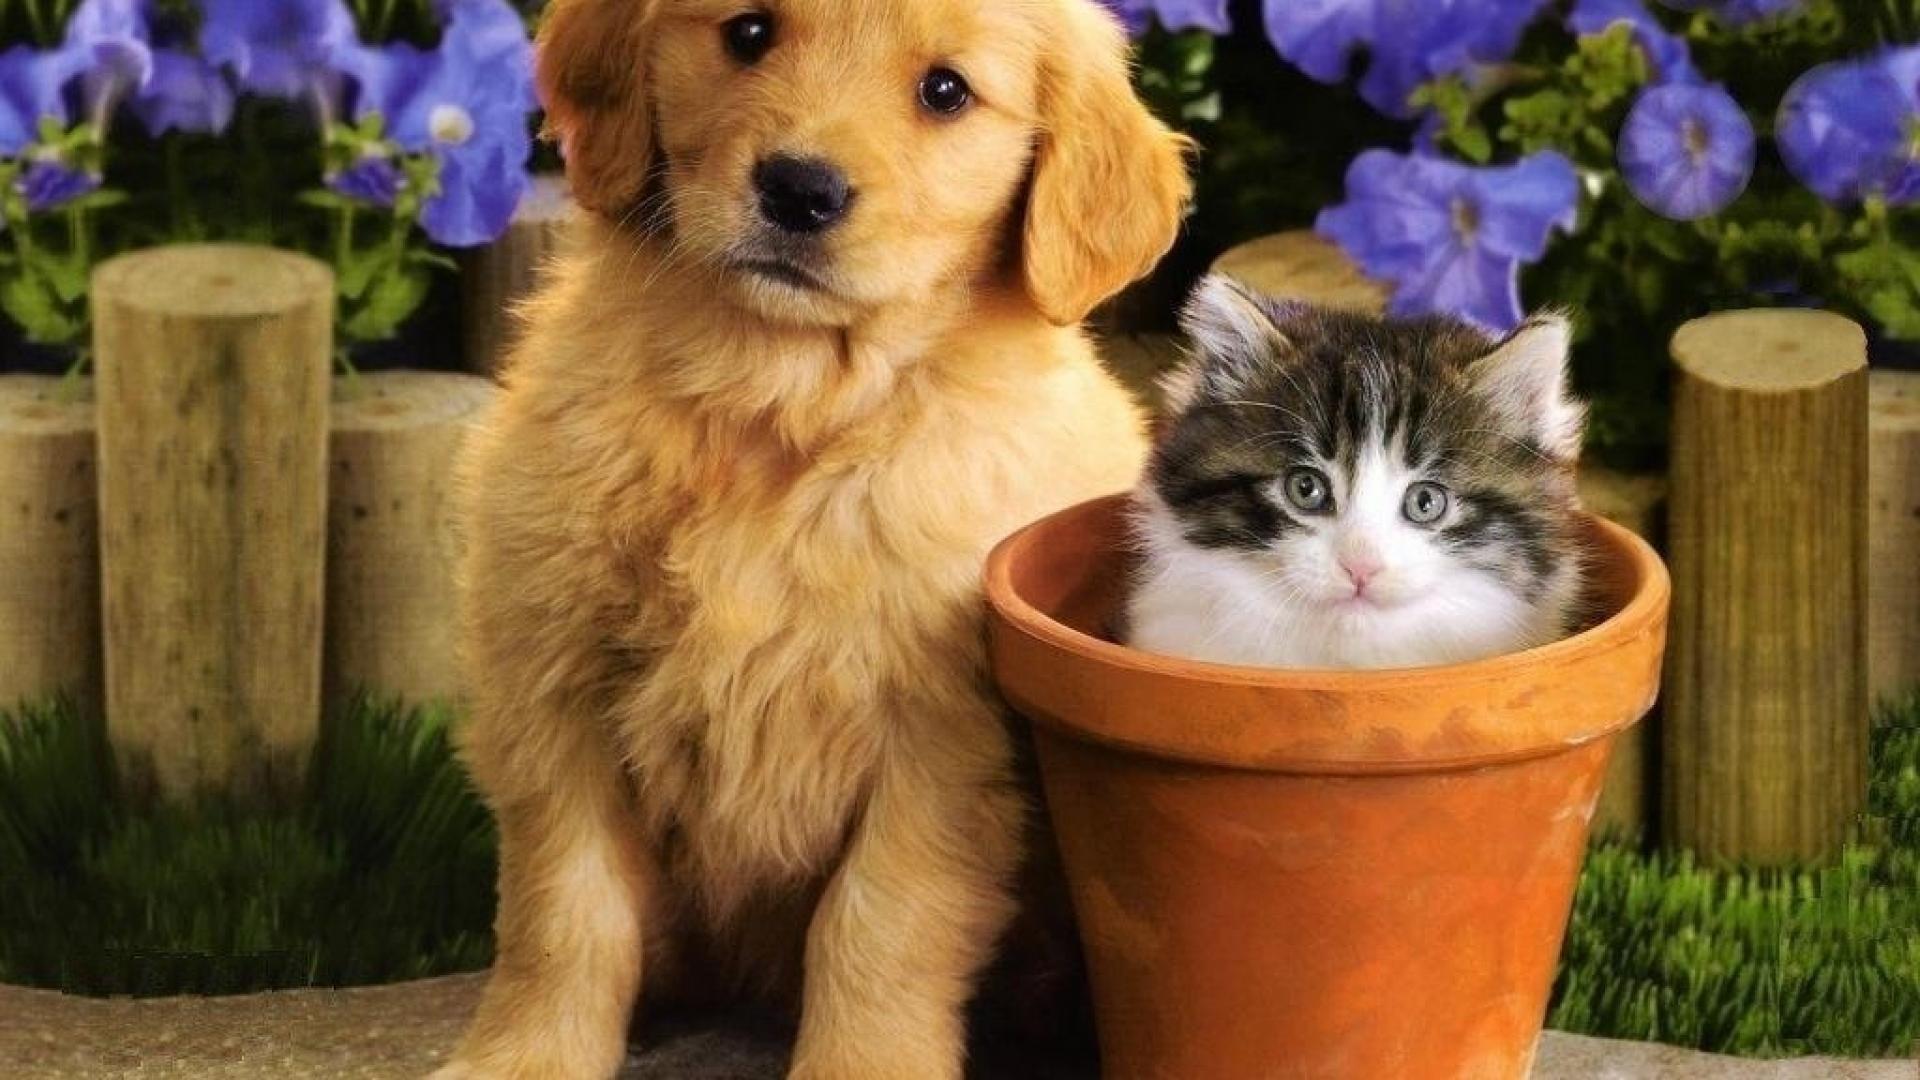 Puppy And Kitten beautiful wallpaper